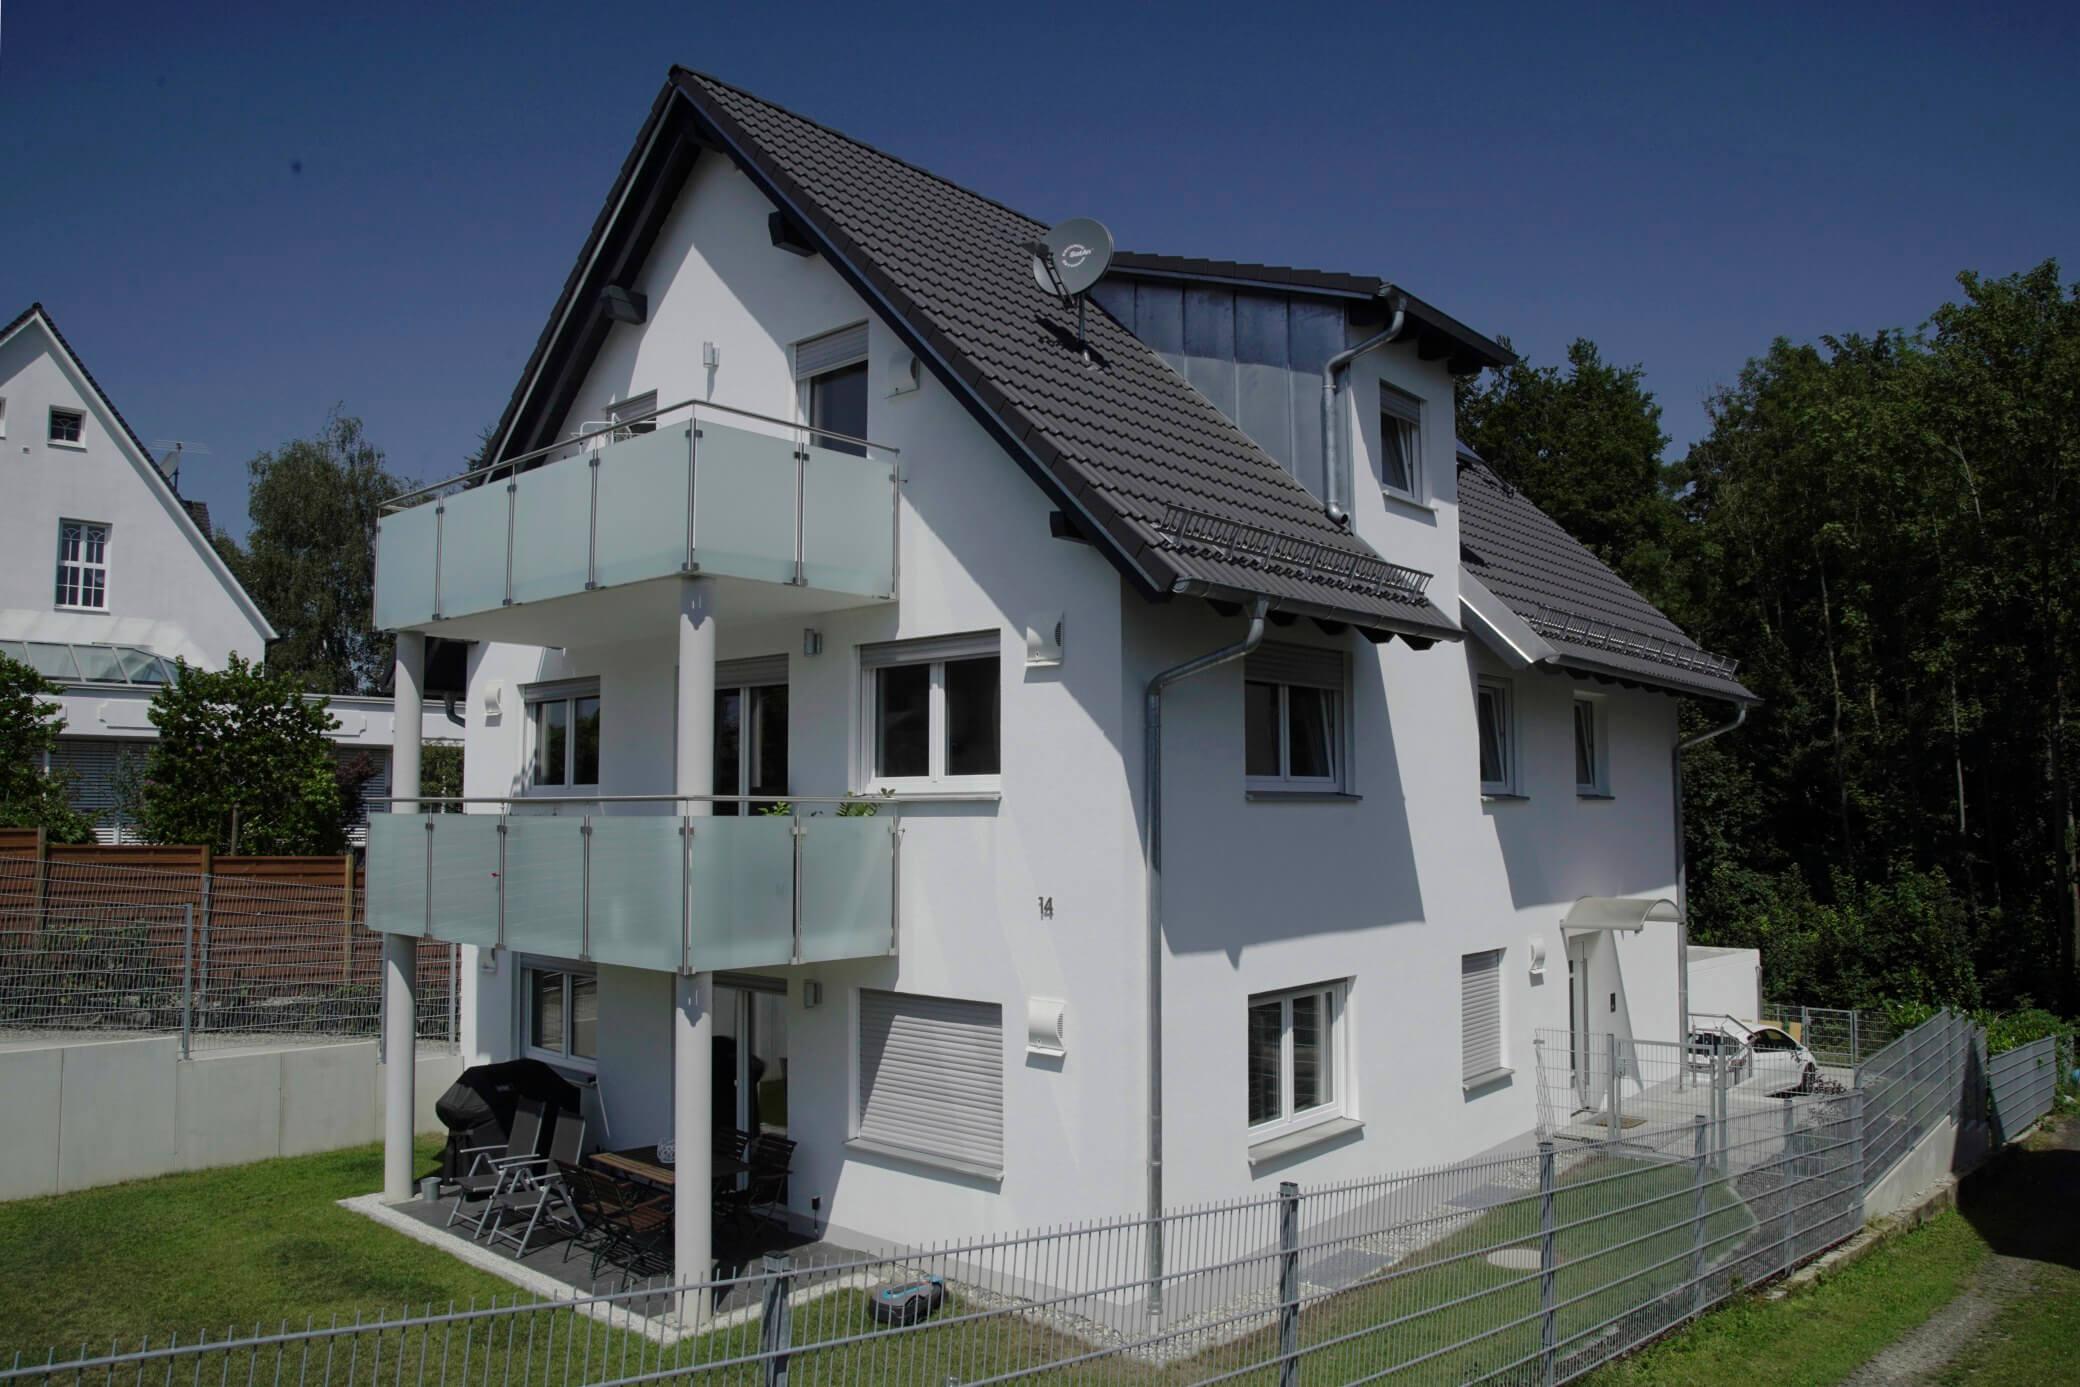 K&K Bau GmbH Massivhaus Referenzbild 6